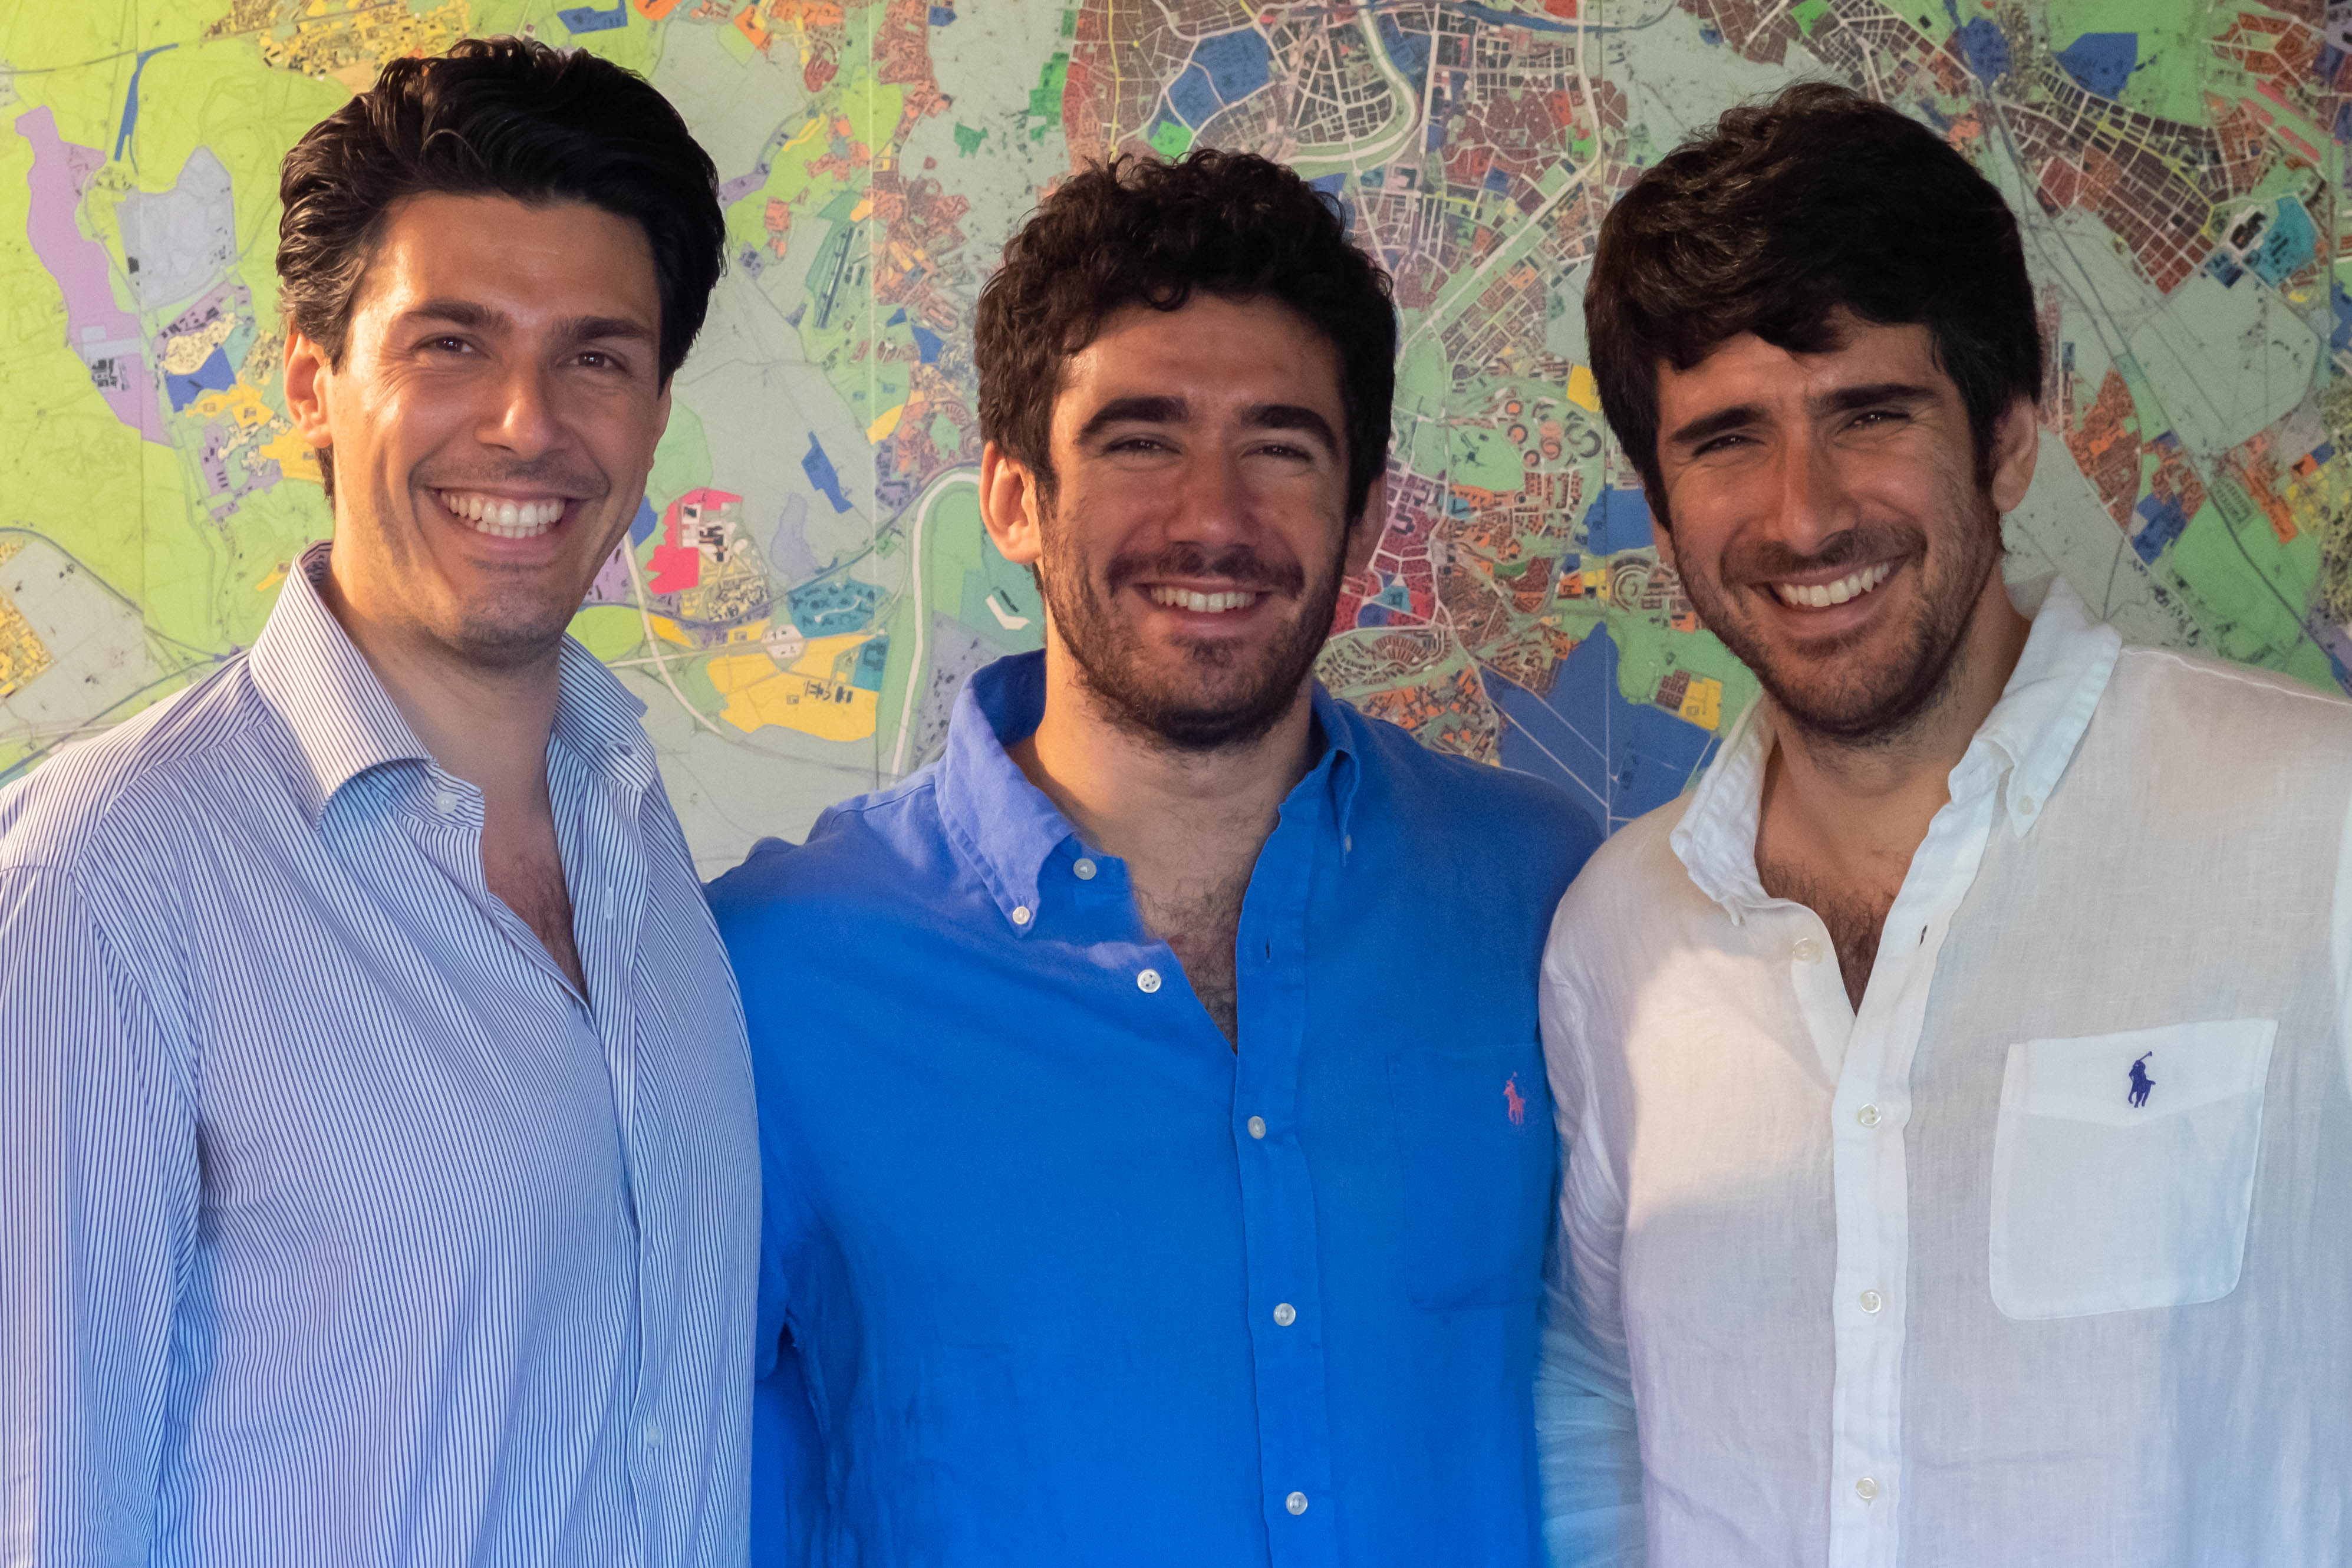 Arch. Paolo Cinti, Dott. Giulio Cinti ed Arch. Dario Cinti